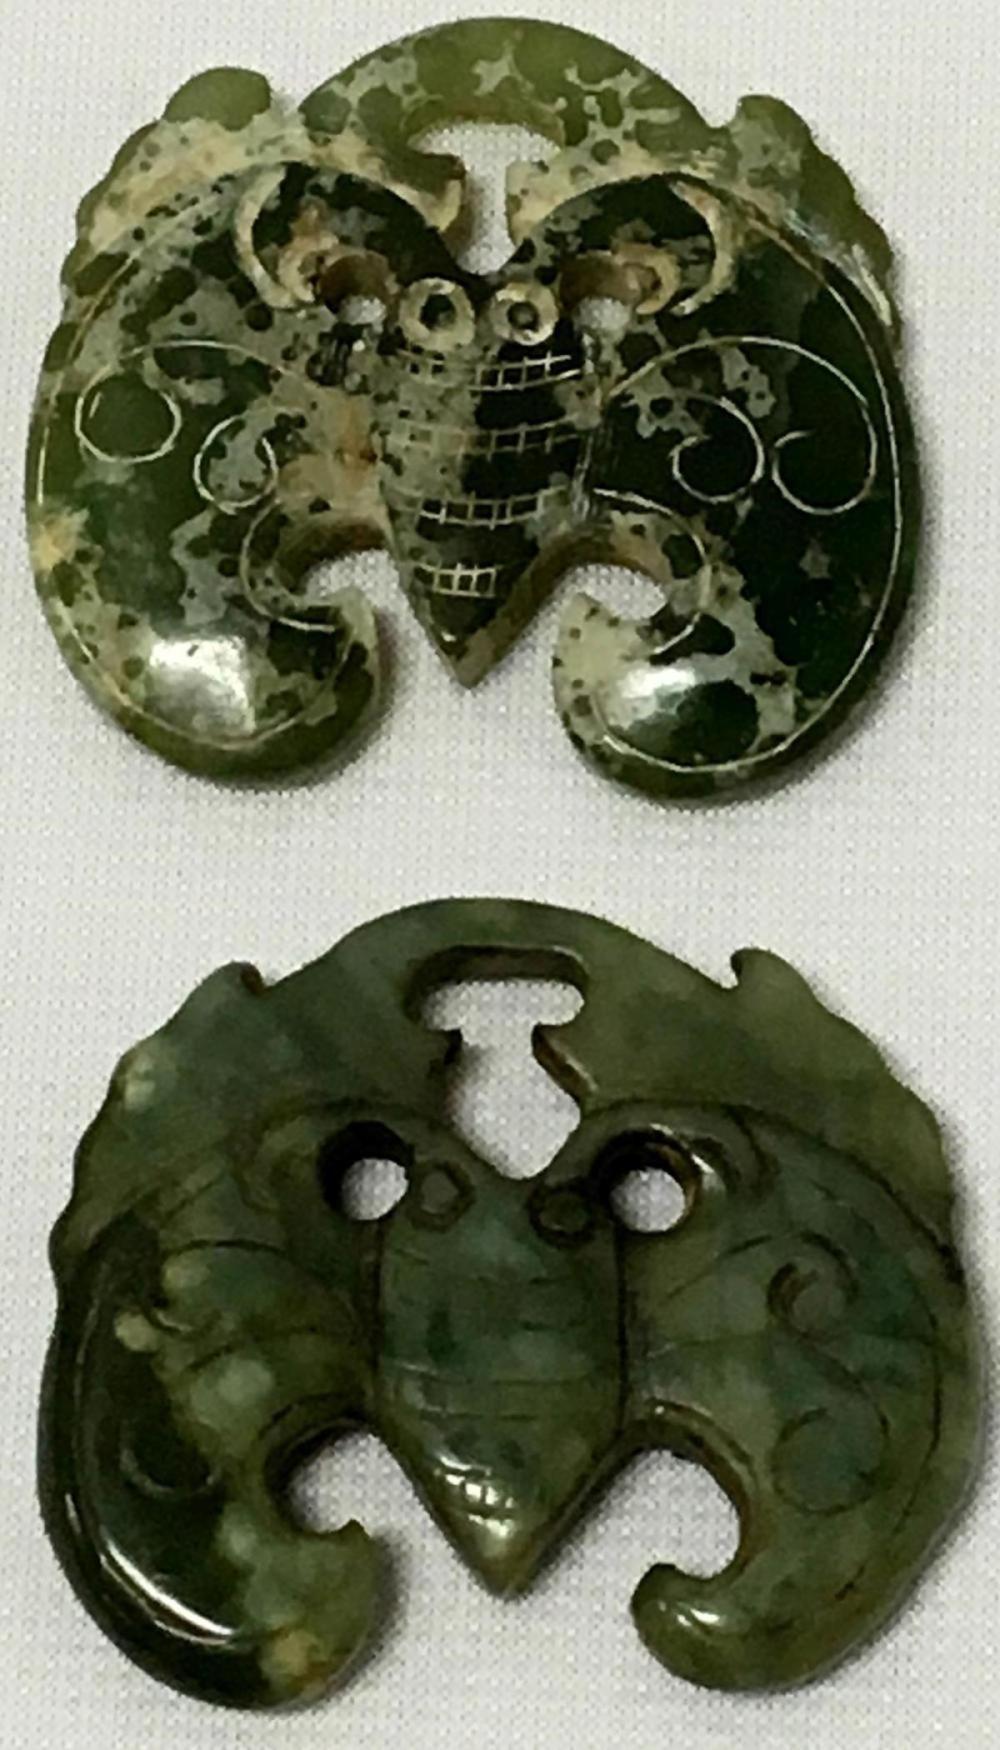 Vintage Lot of 2 Chinese Jade Bowenite Matrix Carved Figural Pendants